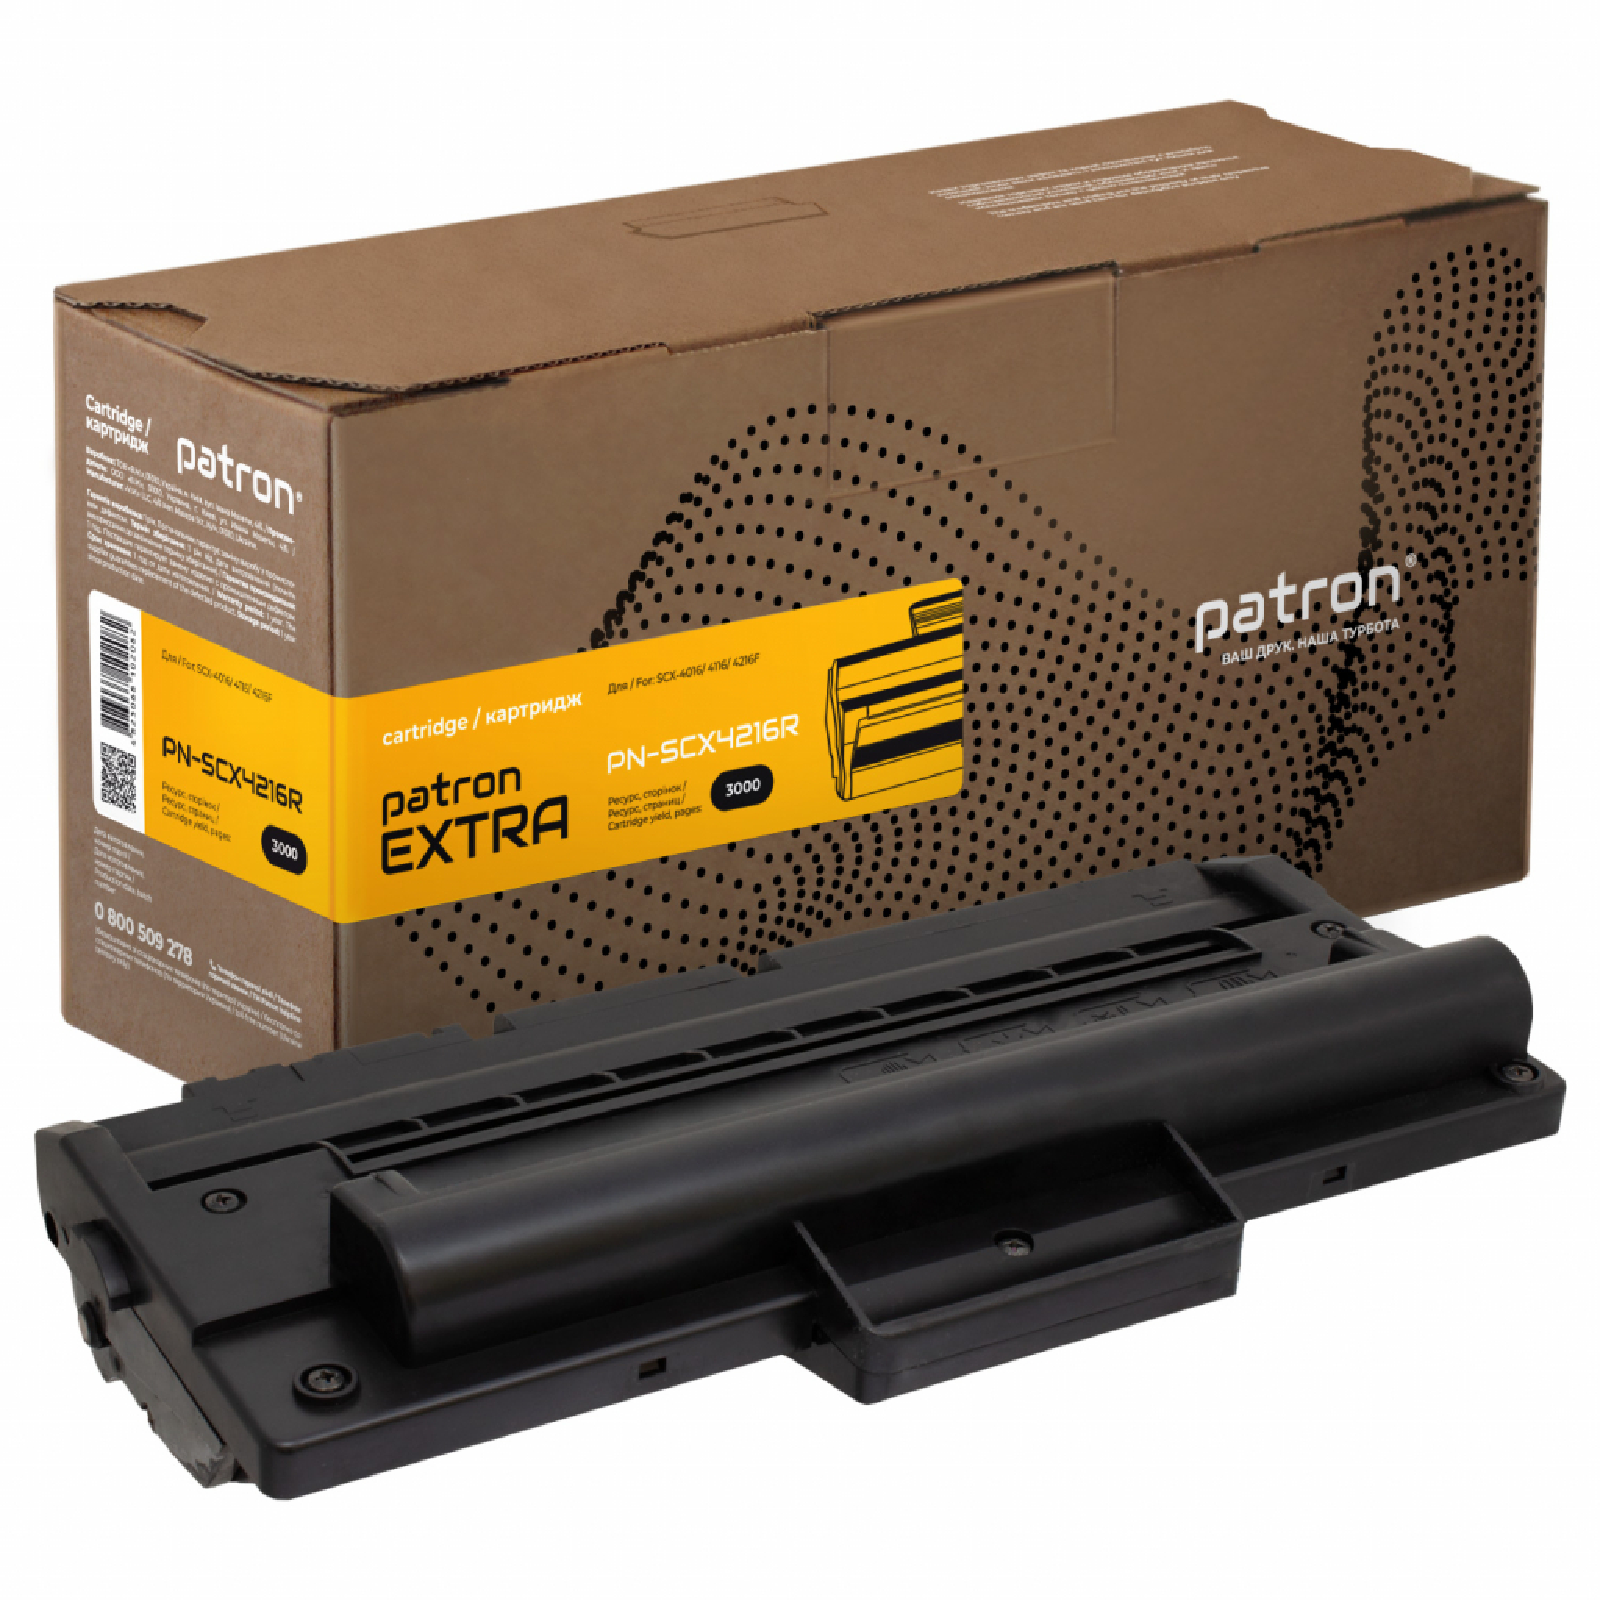 Картридж PATRON SAMSUNG SCX-4216D3 (PN-SCX4216R) Extra (CT-SAM-SCX-4216-PN-R)